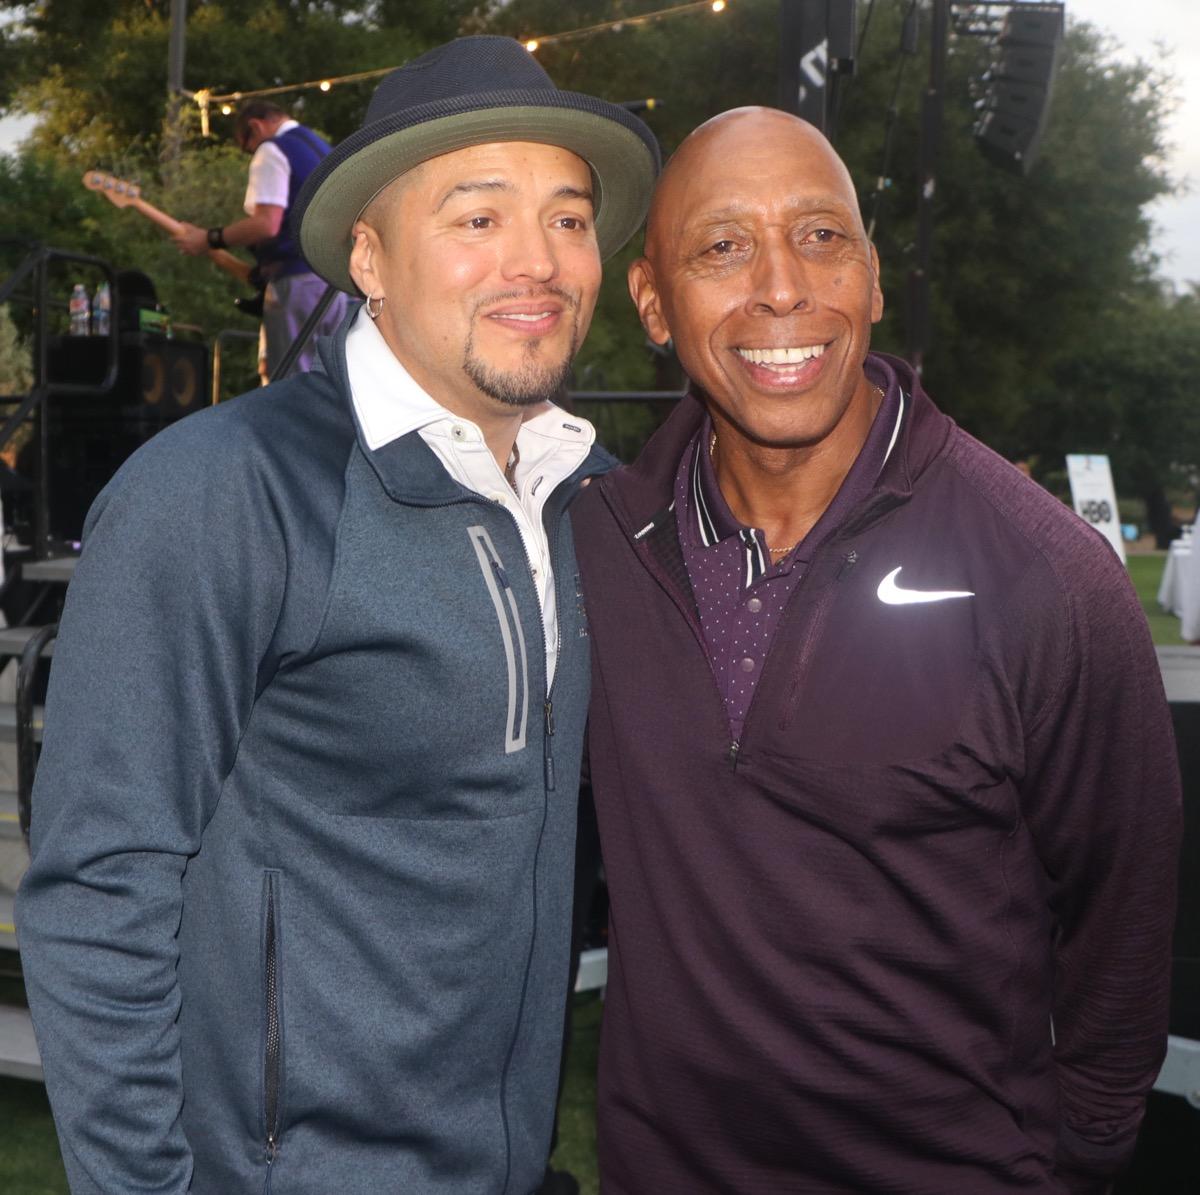 12th Annual George Lopez Celebrity Golf Classic Photos - 186.jpg